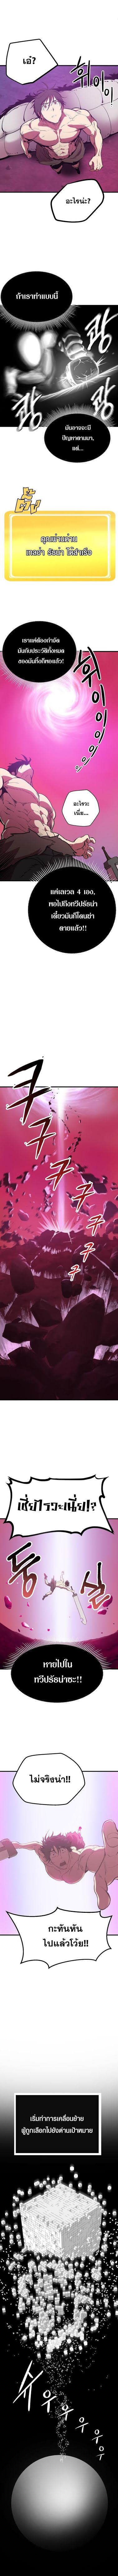 Survival of Blade King - หน้า 10